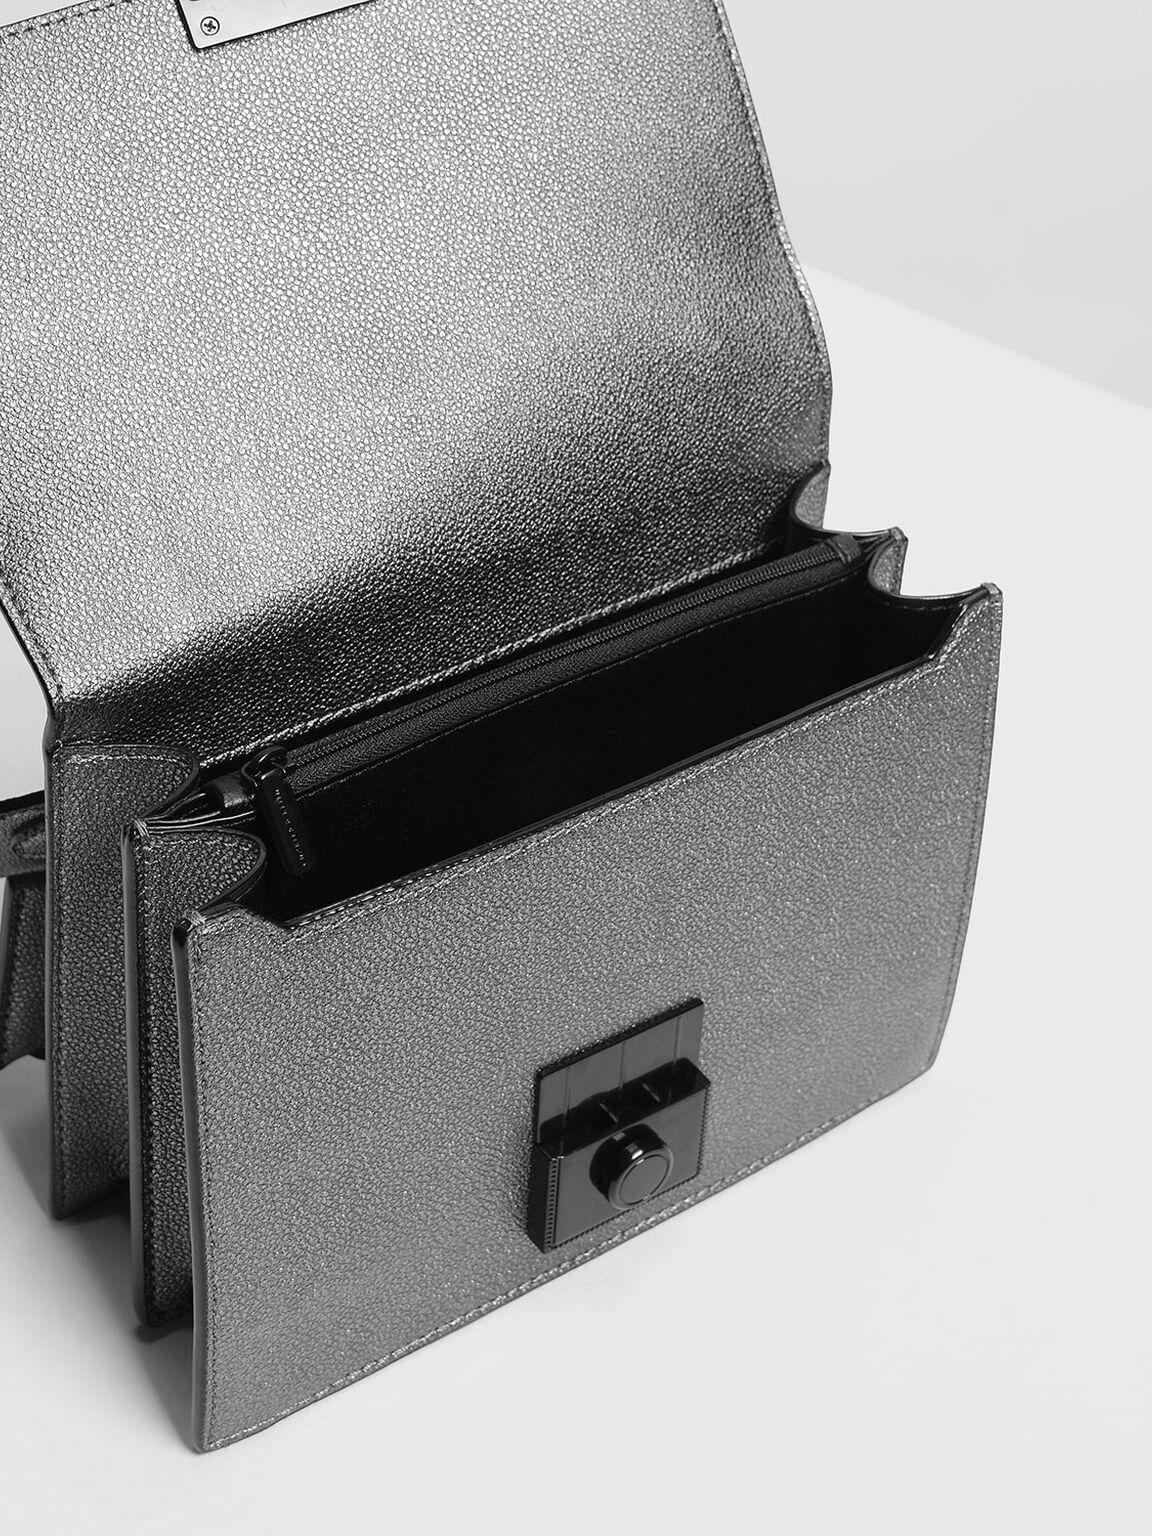 Structured Crossbody Bag, Pewter, hi-res